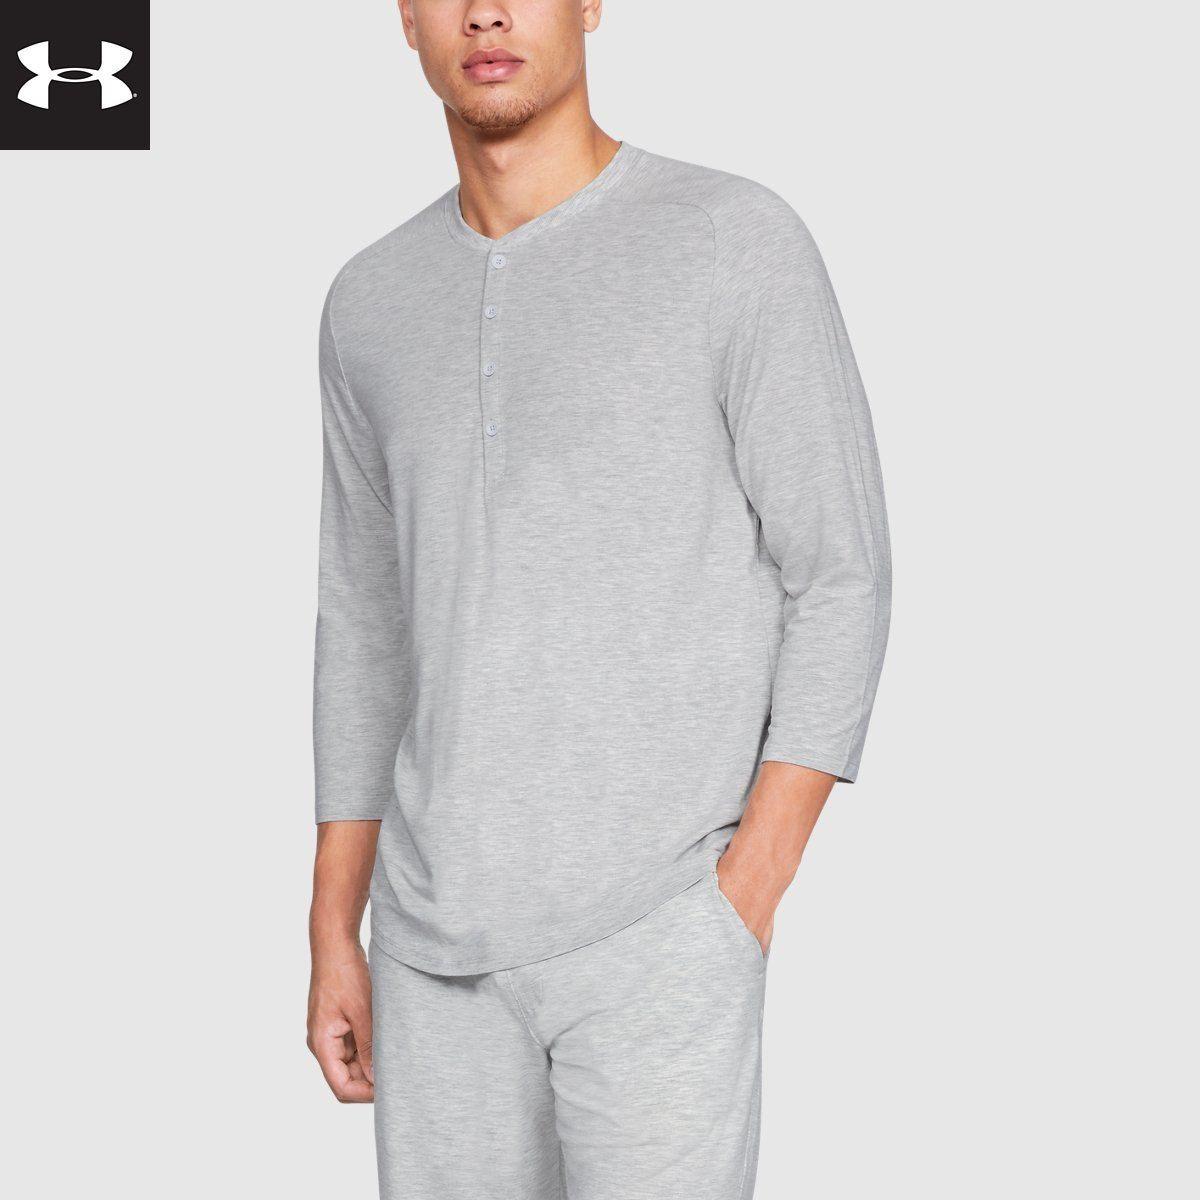 Athlete recovery sleepwear ultra comfort under armour